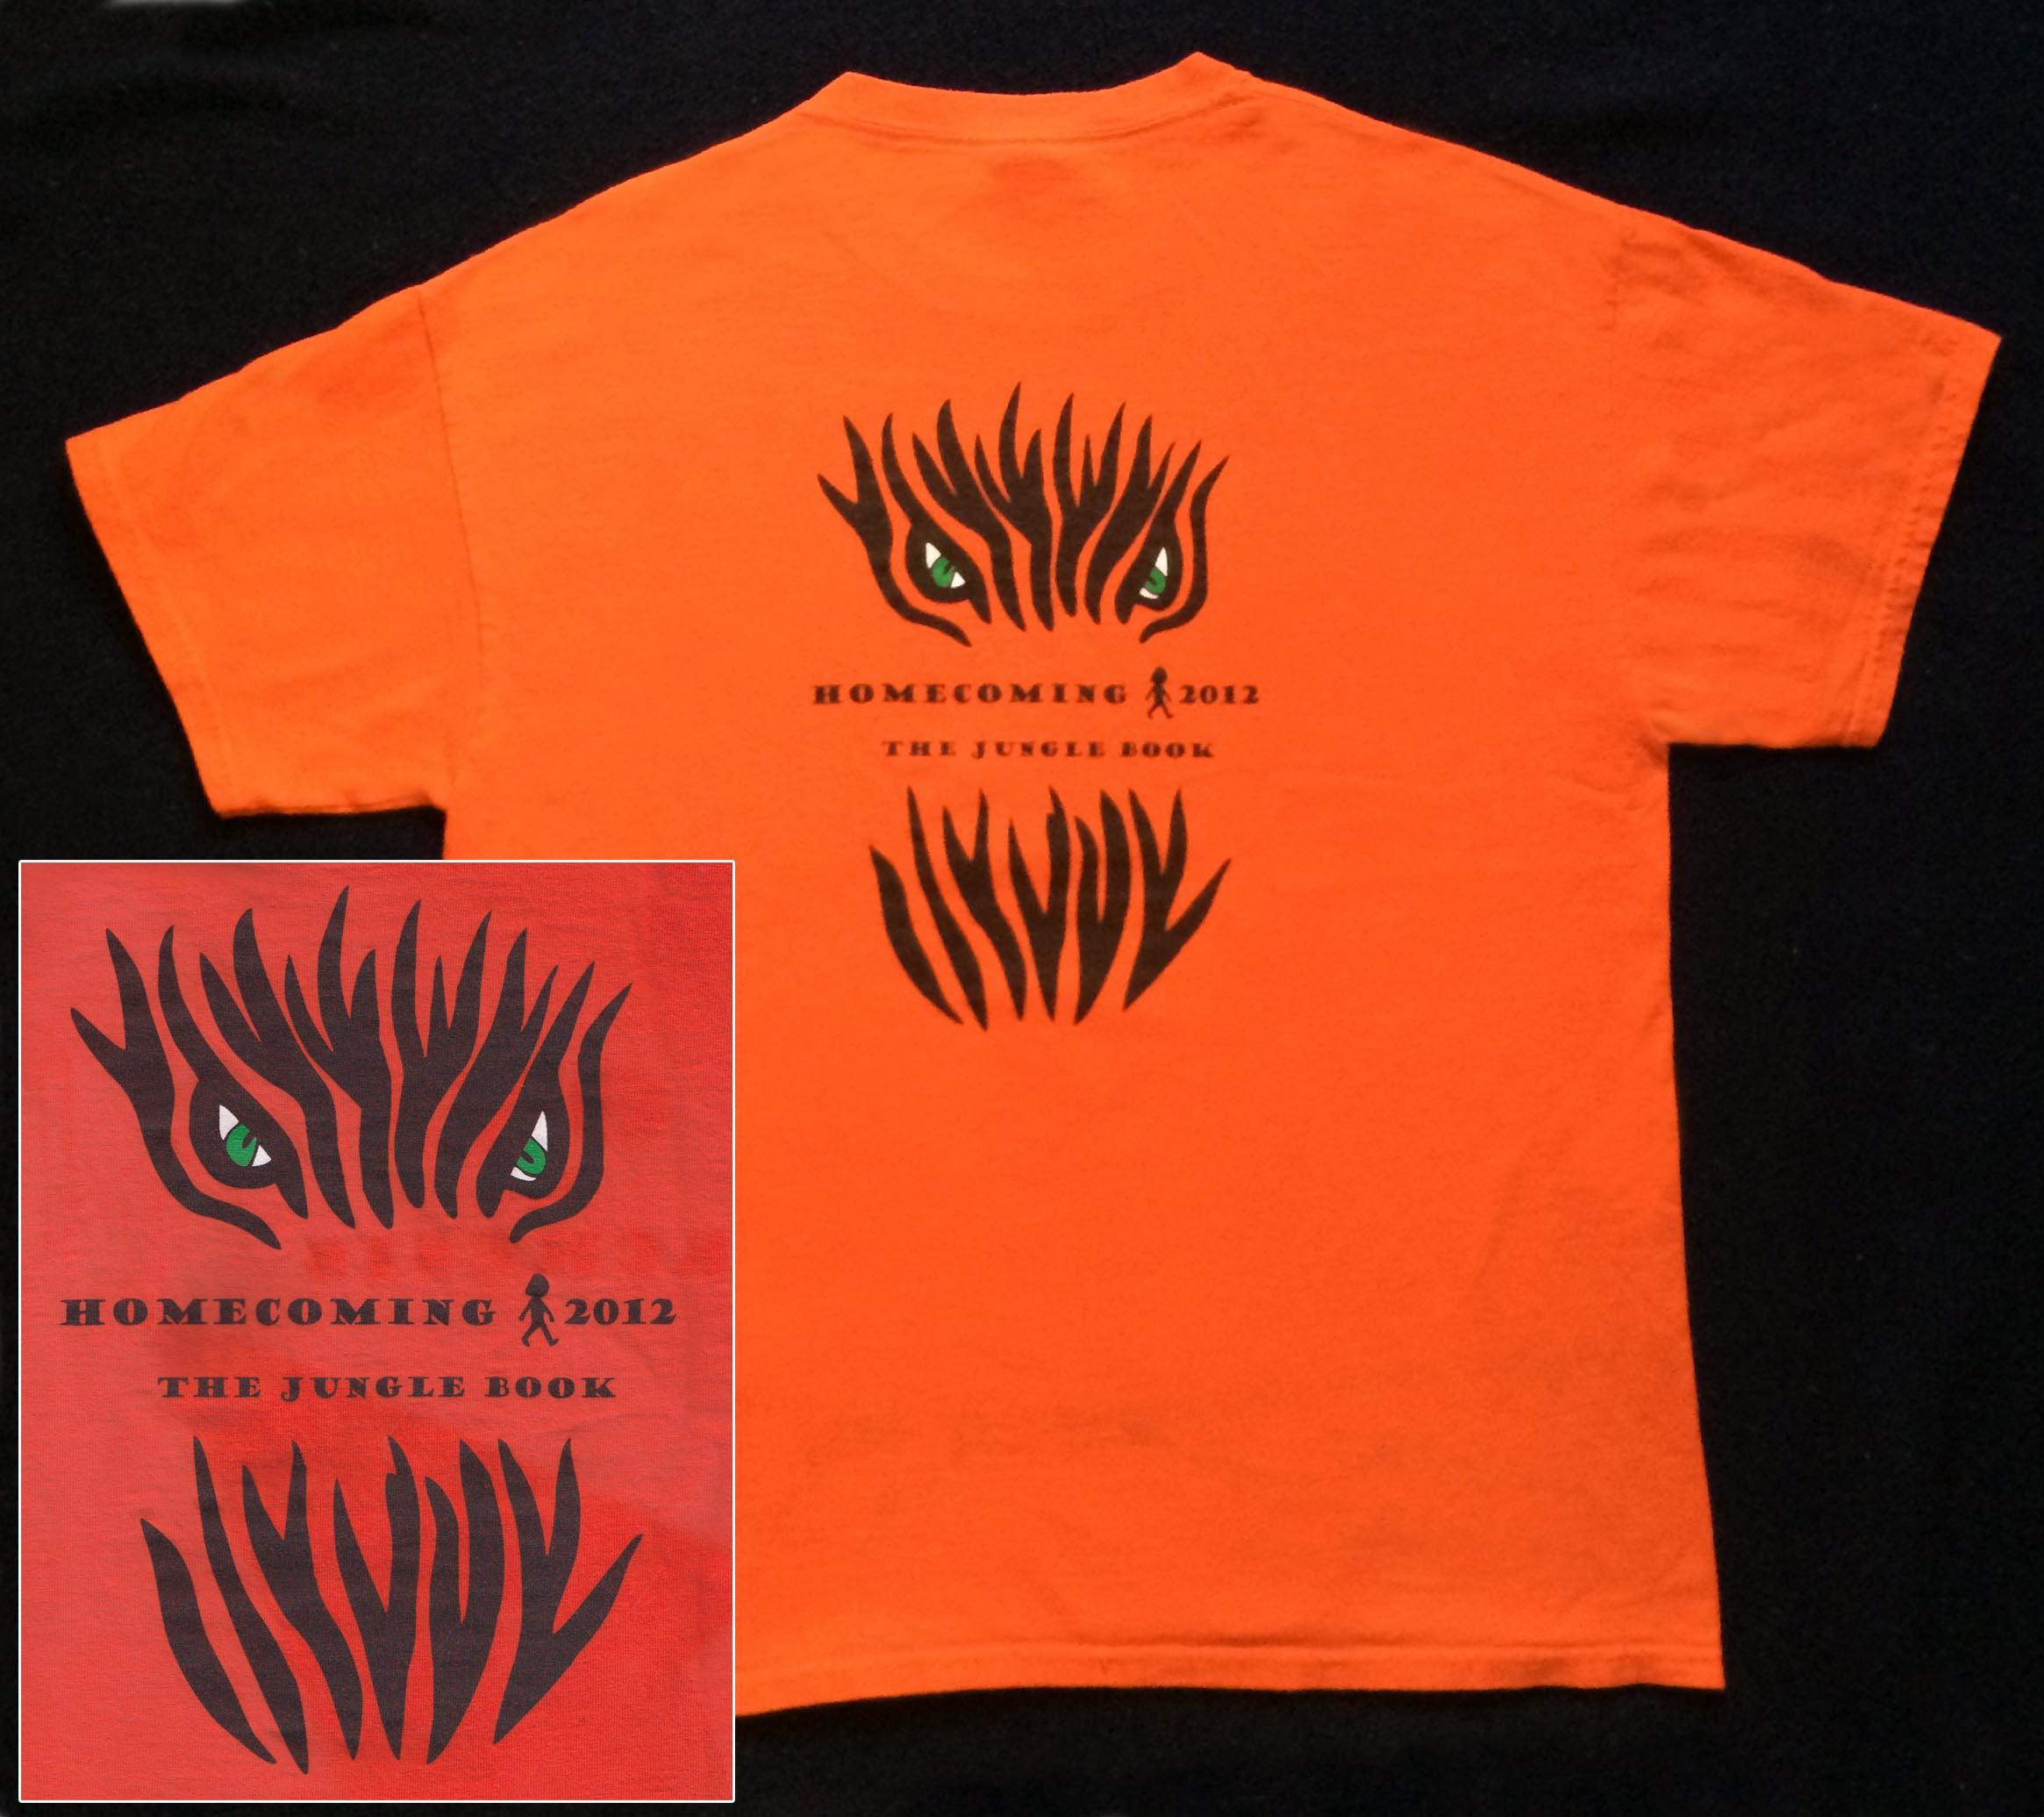 2012 Homecoming T-Shirt (Back) - Oct 6, 2012